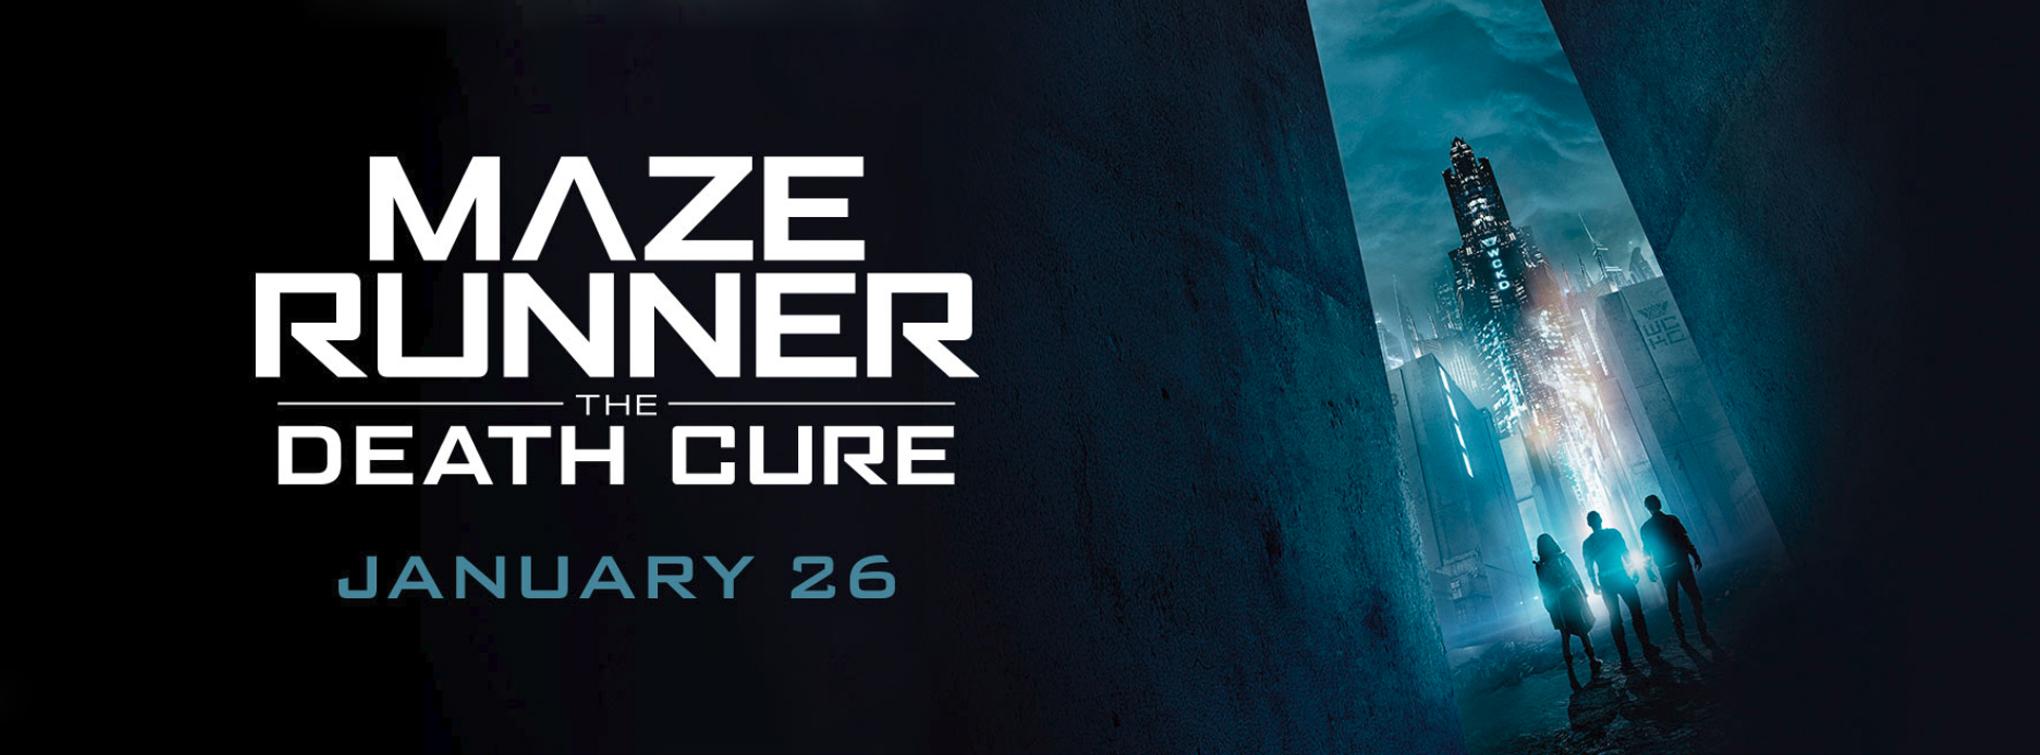 Slider image for Maze Runner: The Death Cure